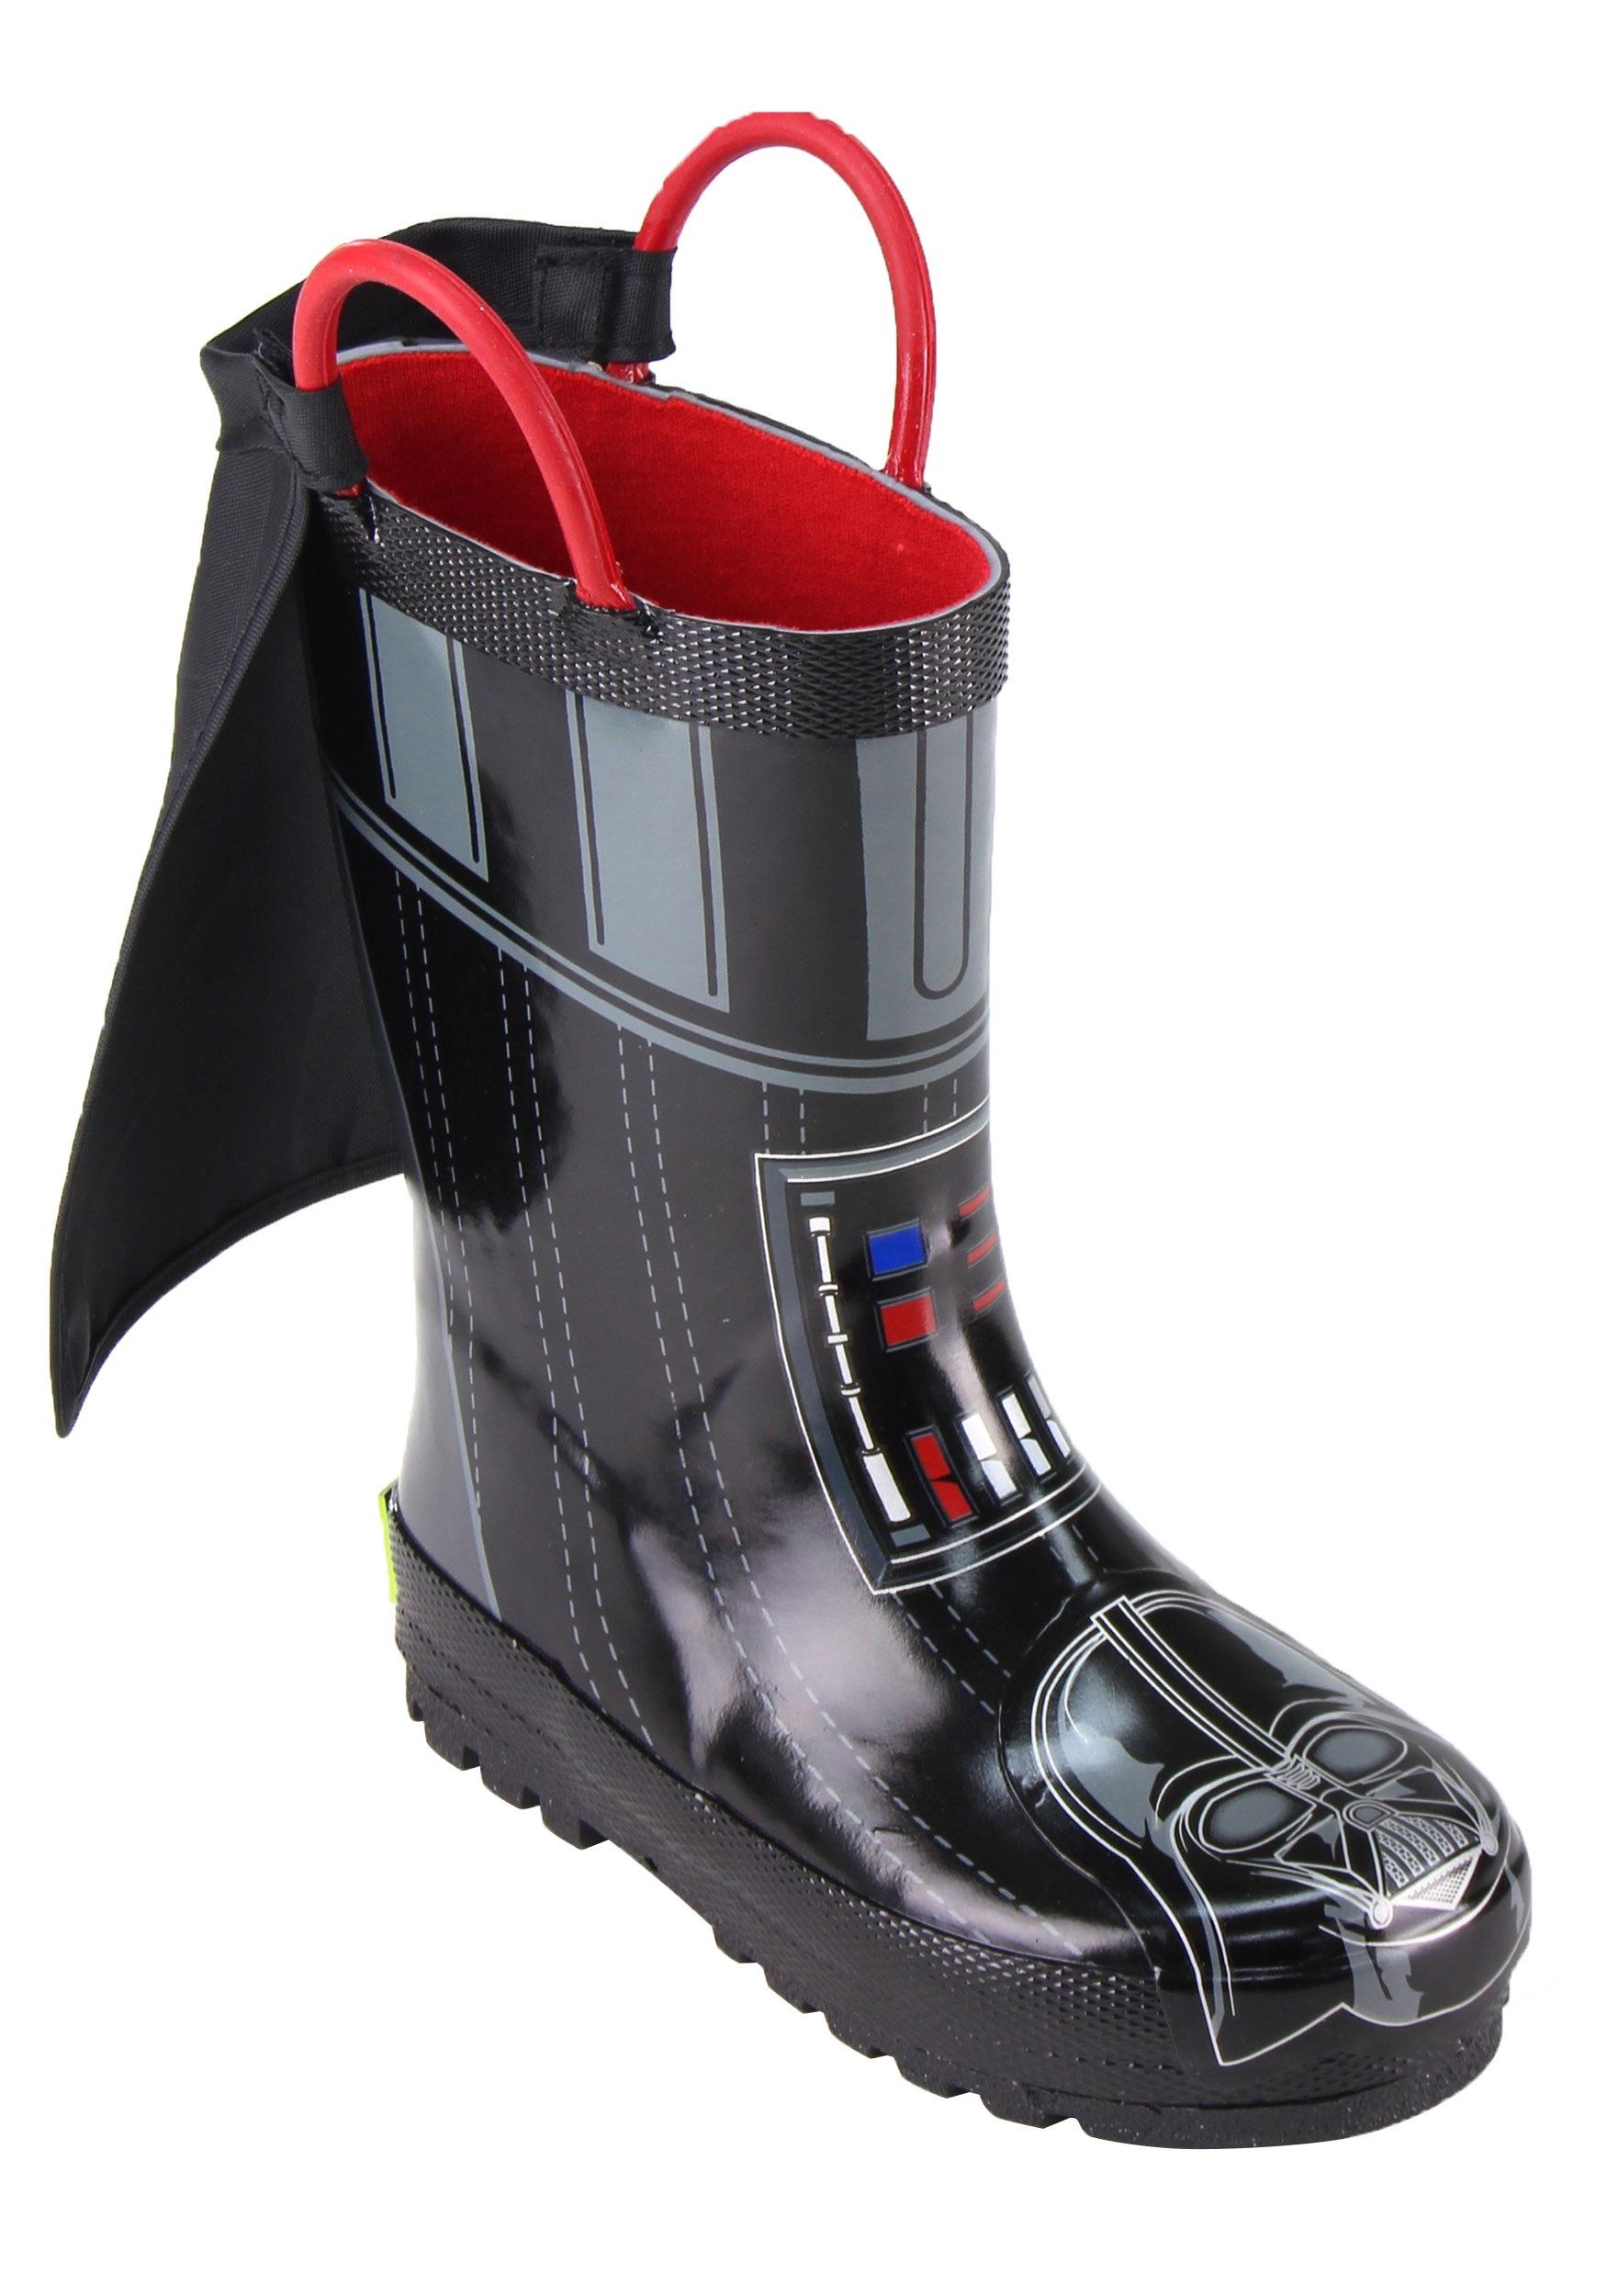 Star Wars Darth Vader Rain Boots for Kids